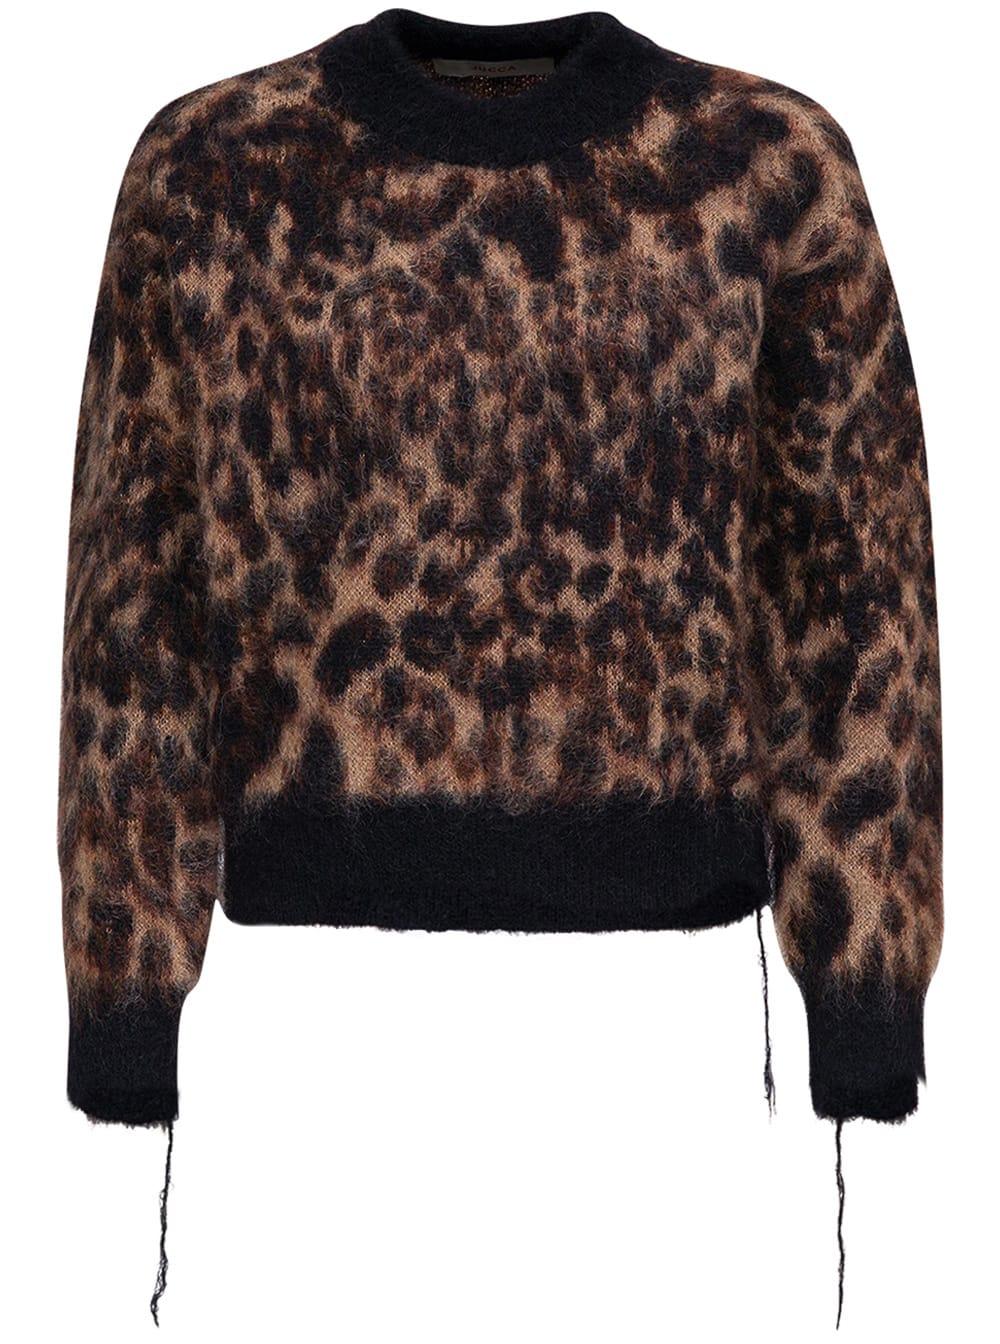 Animalier Mohair Blend Sweater